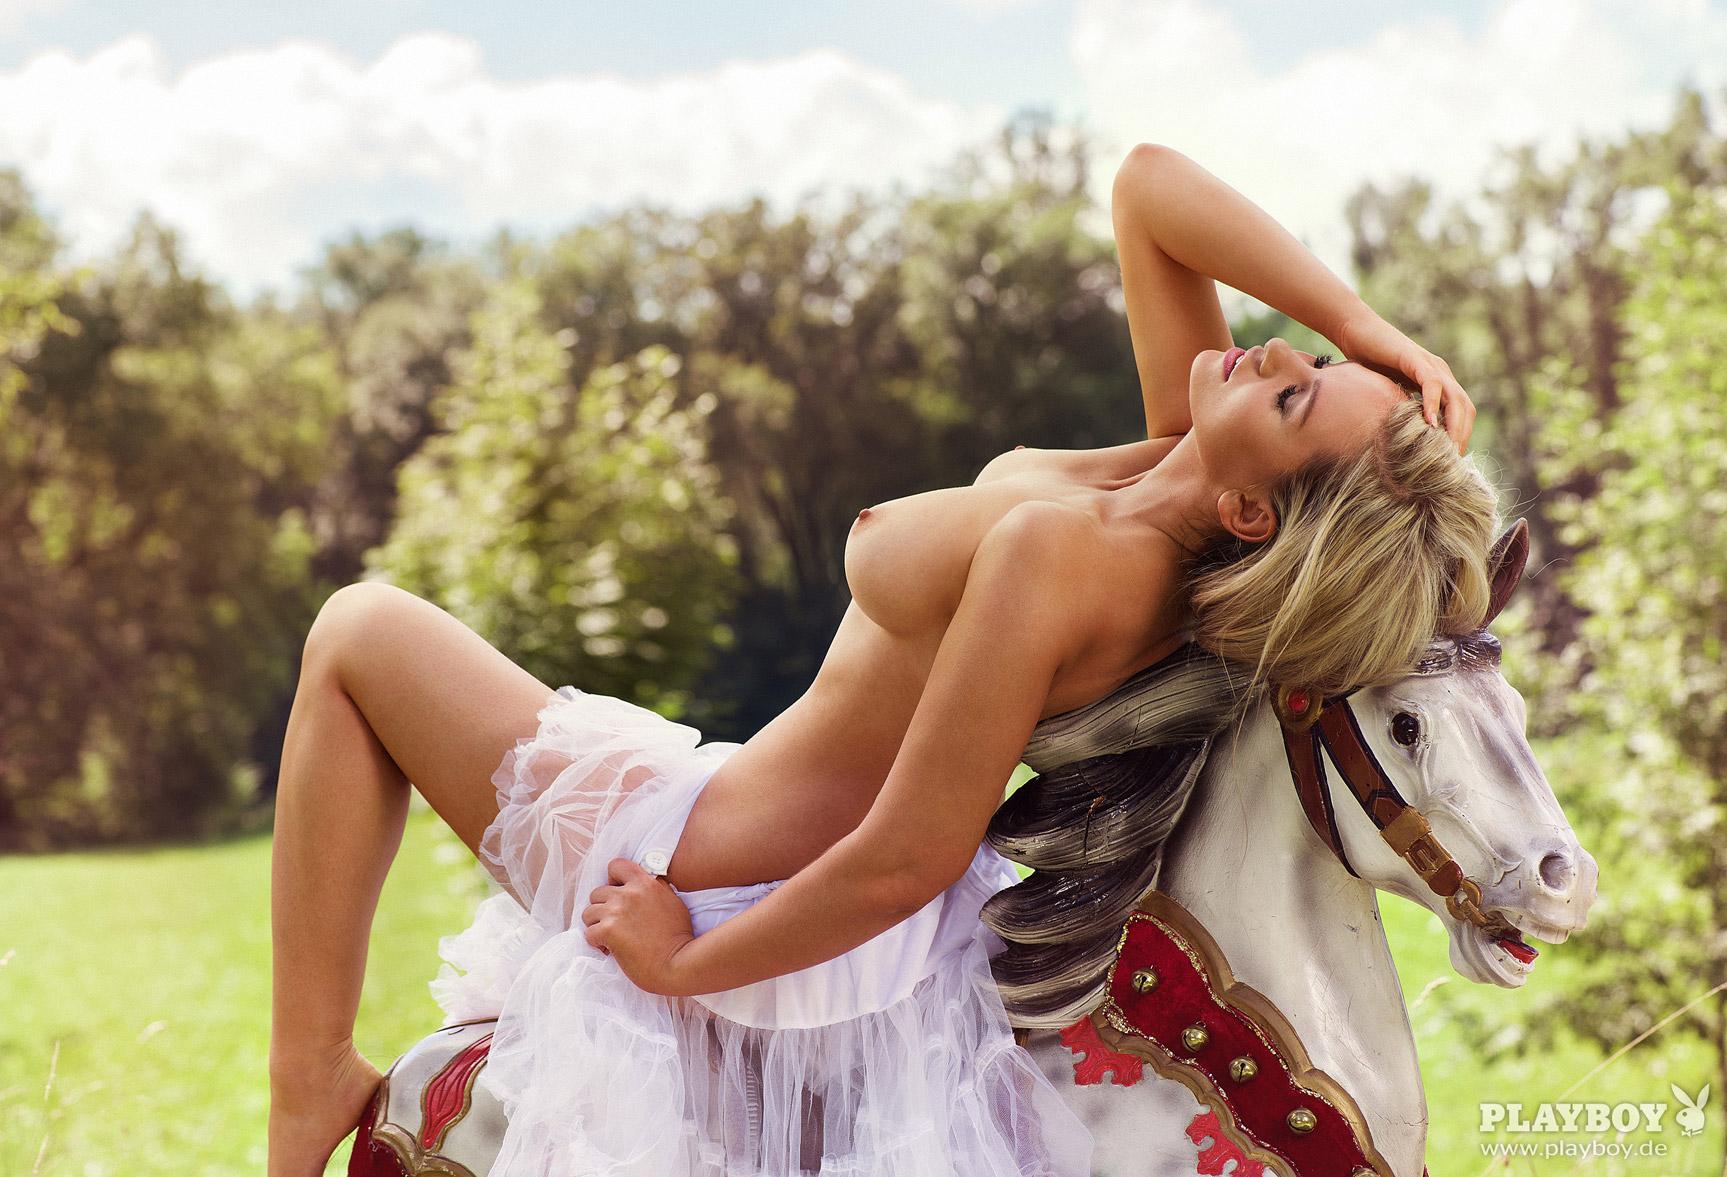 Девушка месяца Кати Керн / Kathie Kern - Playboy Germany october 2016 playmate